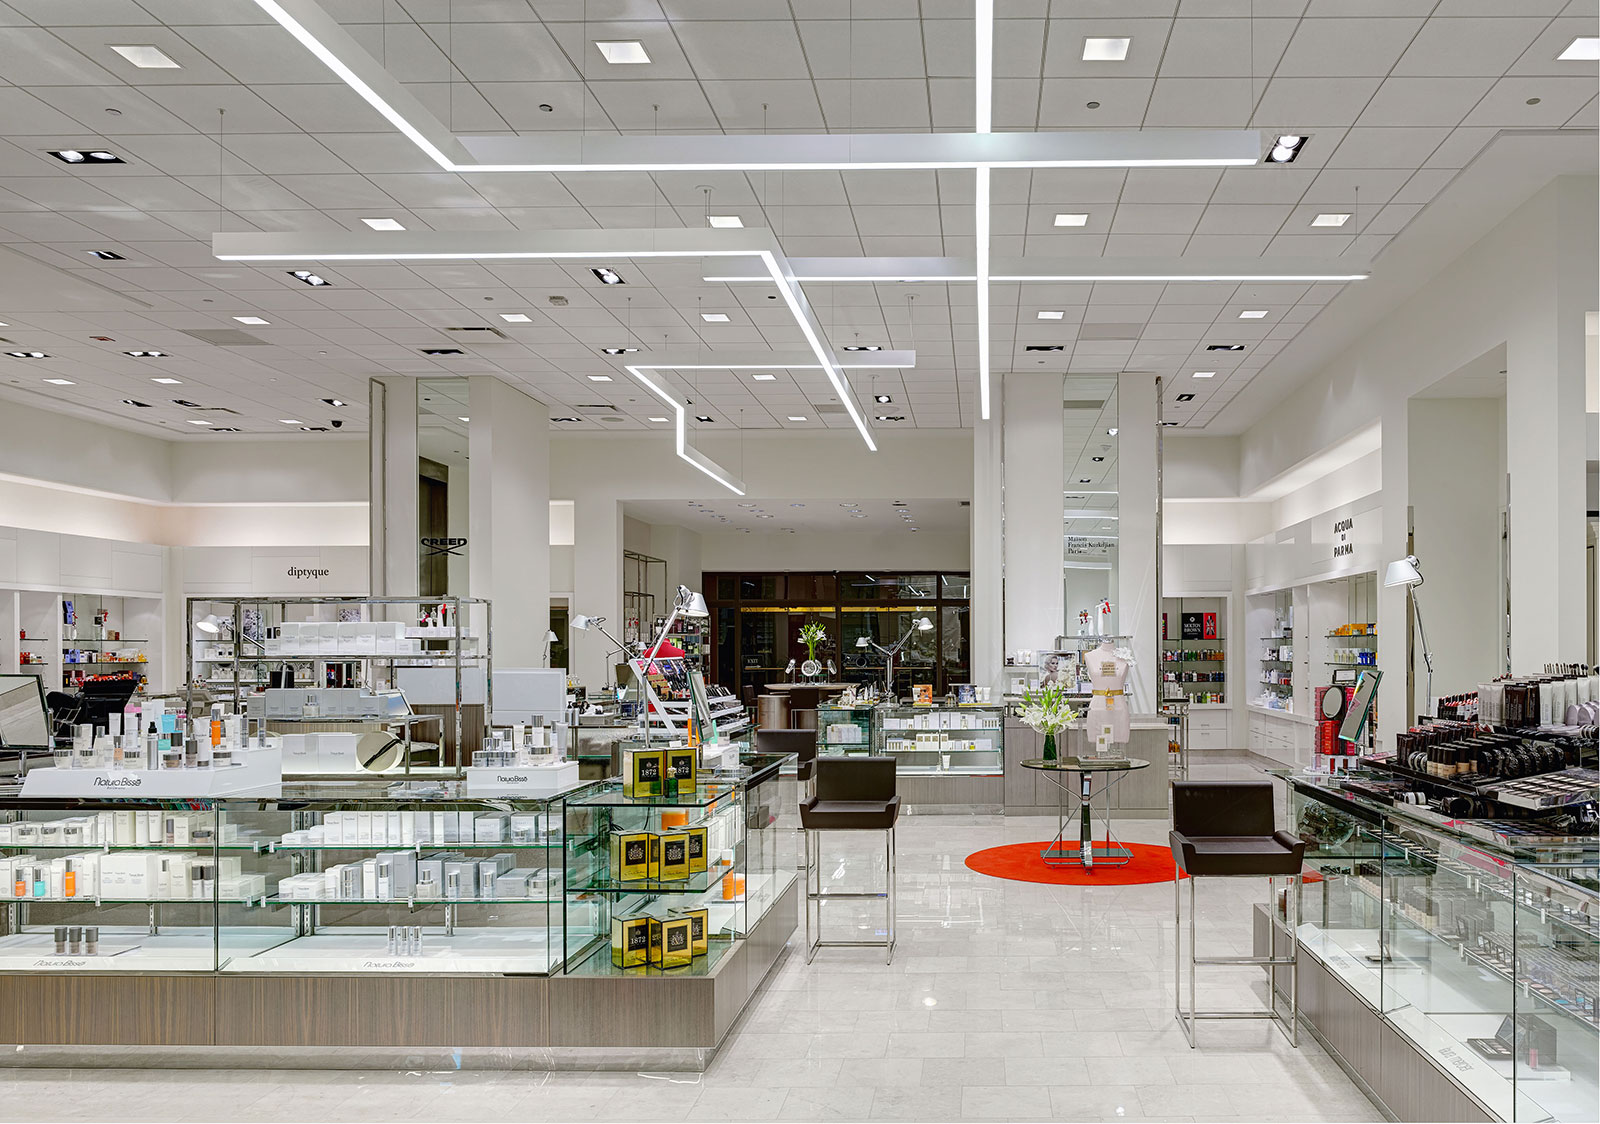 Neiman Marcus OCL Architectural Lighting